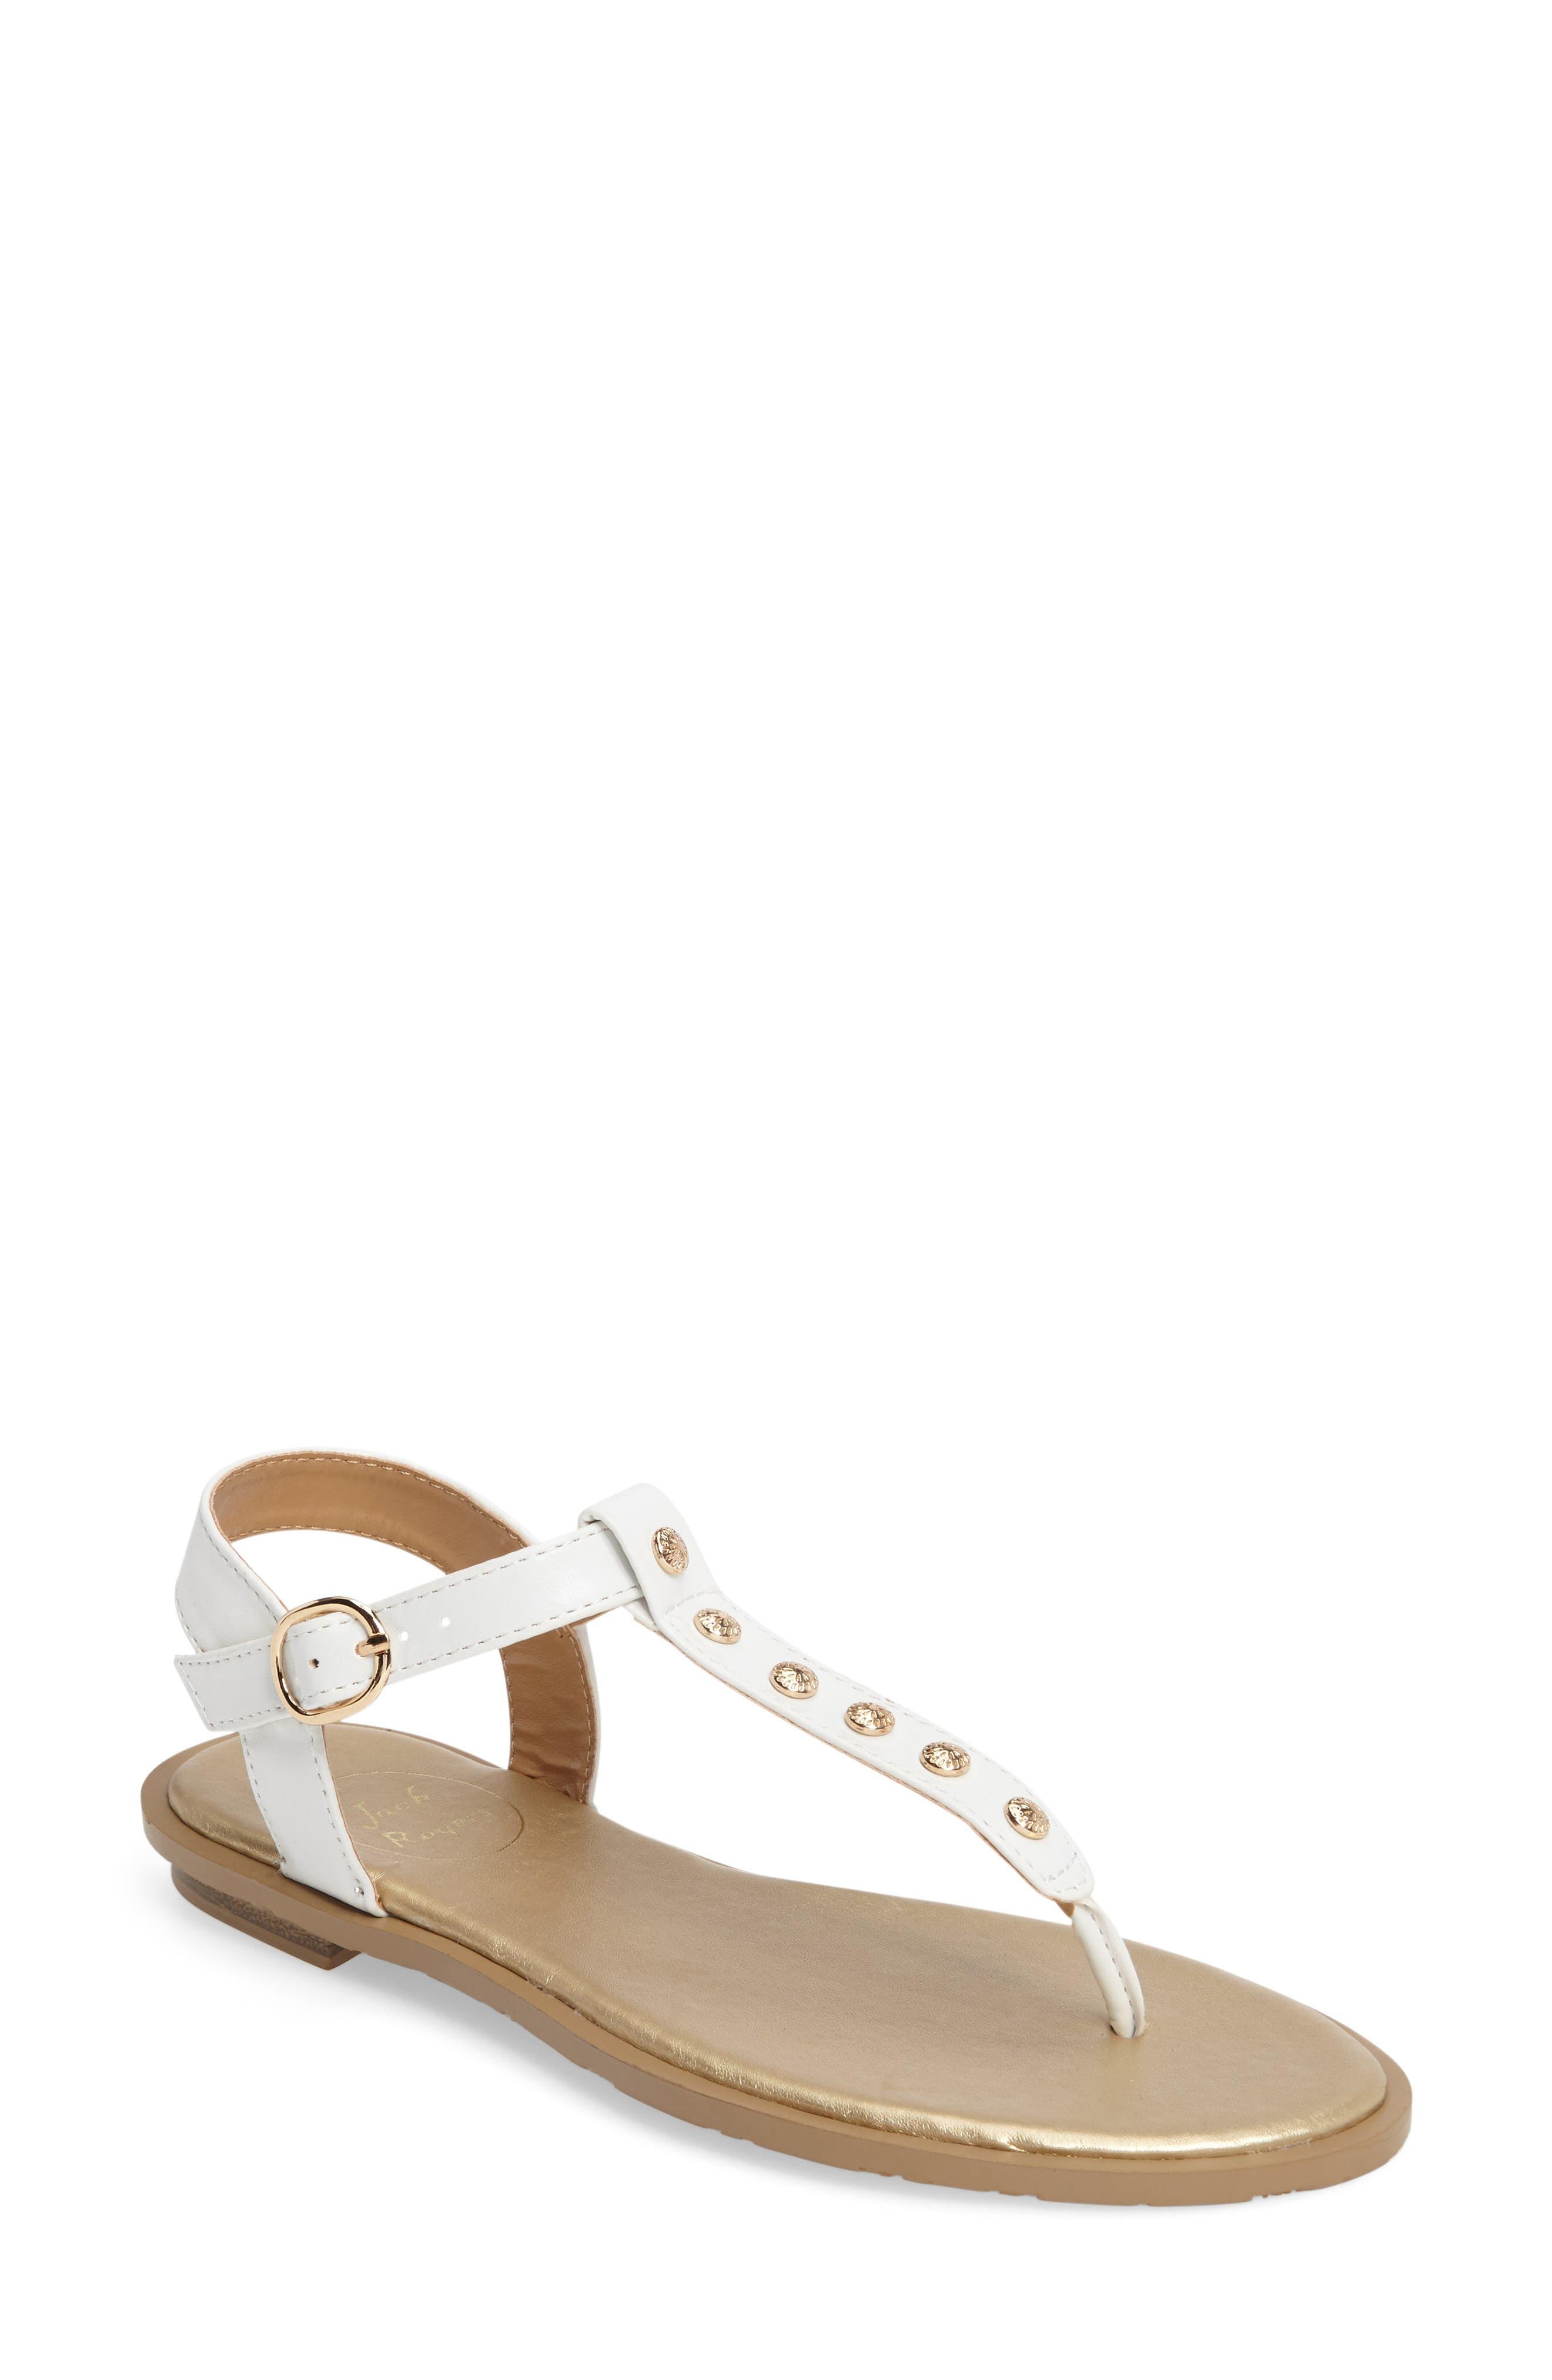 Kamri T-Strap Sandal,                         Main,                         color, White Leather